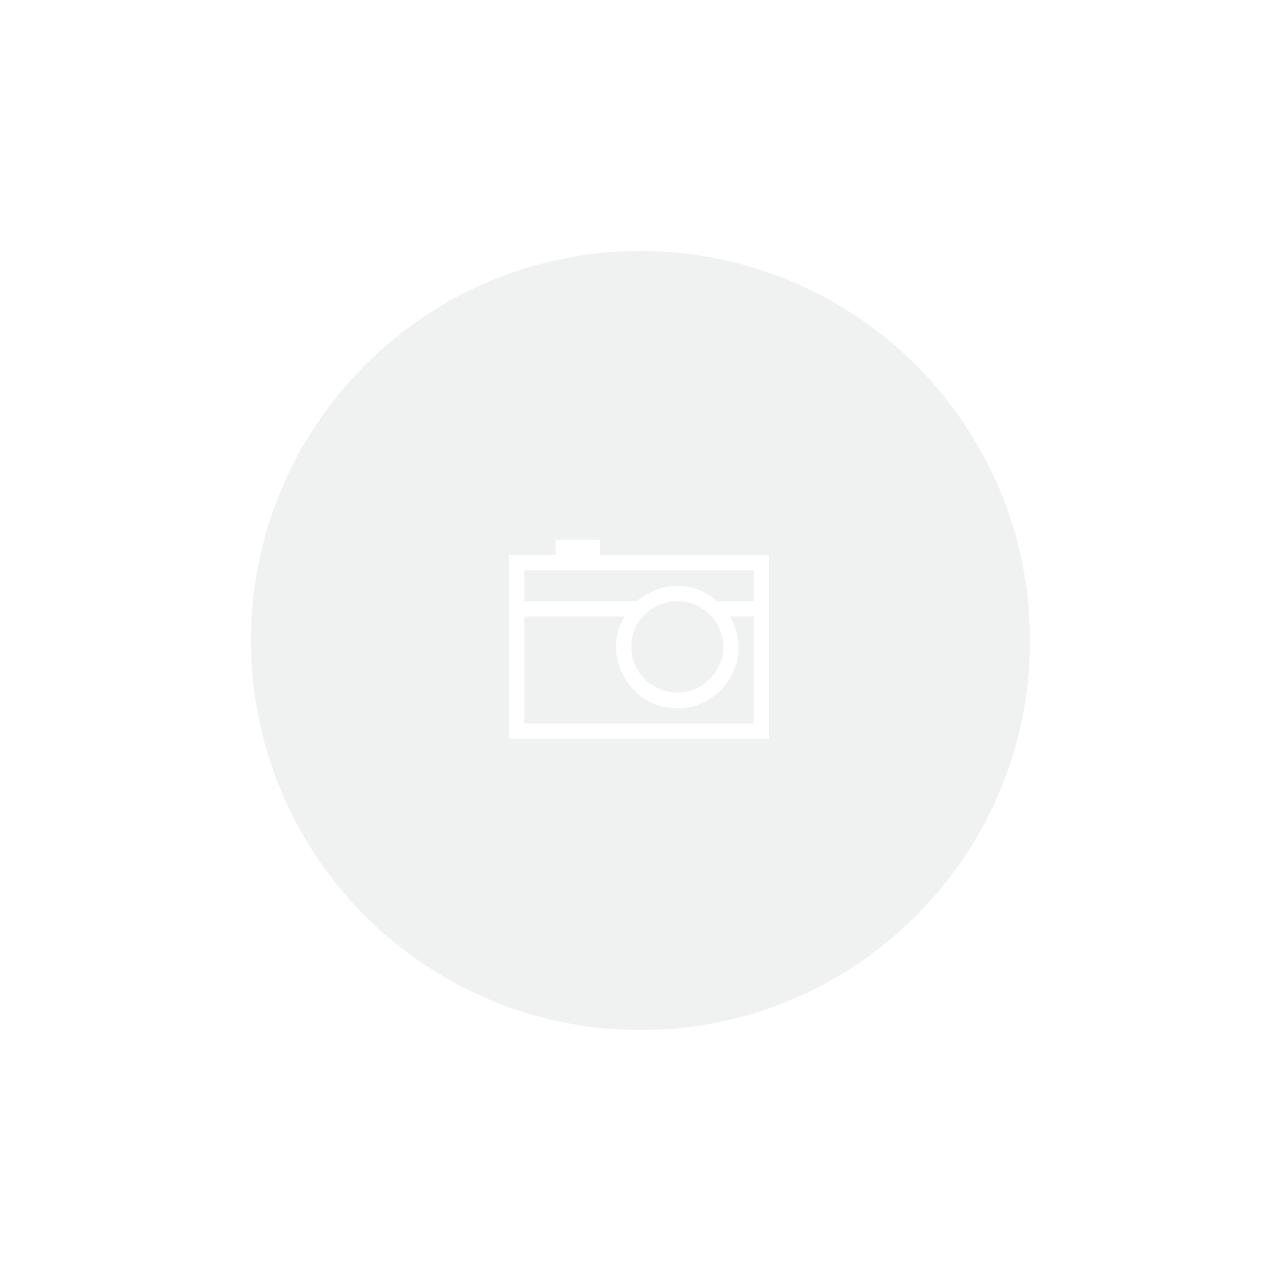 Placa Horizontal 4x2 - 2 módulos separados